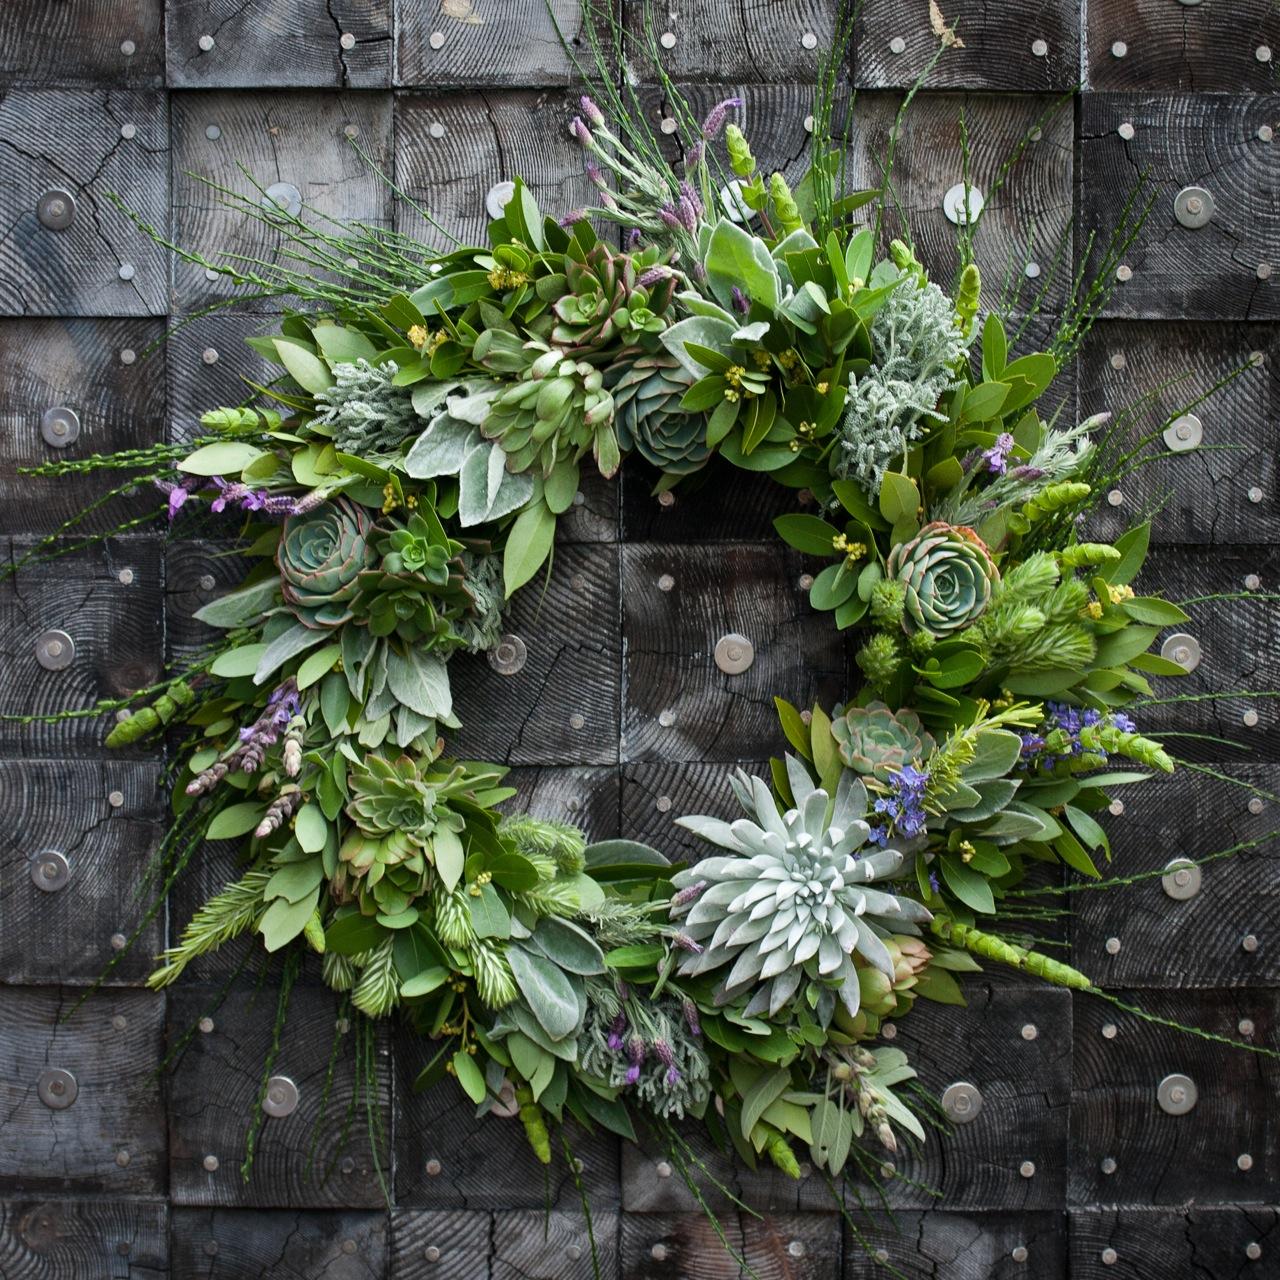 Create a Succulent Wreath